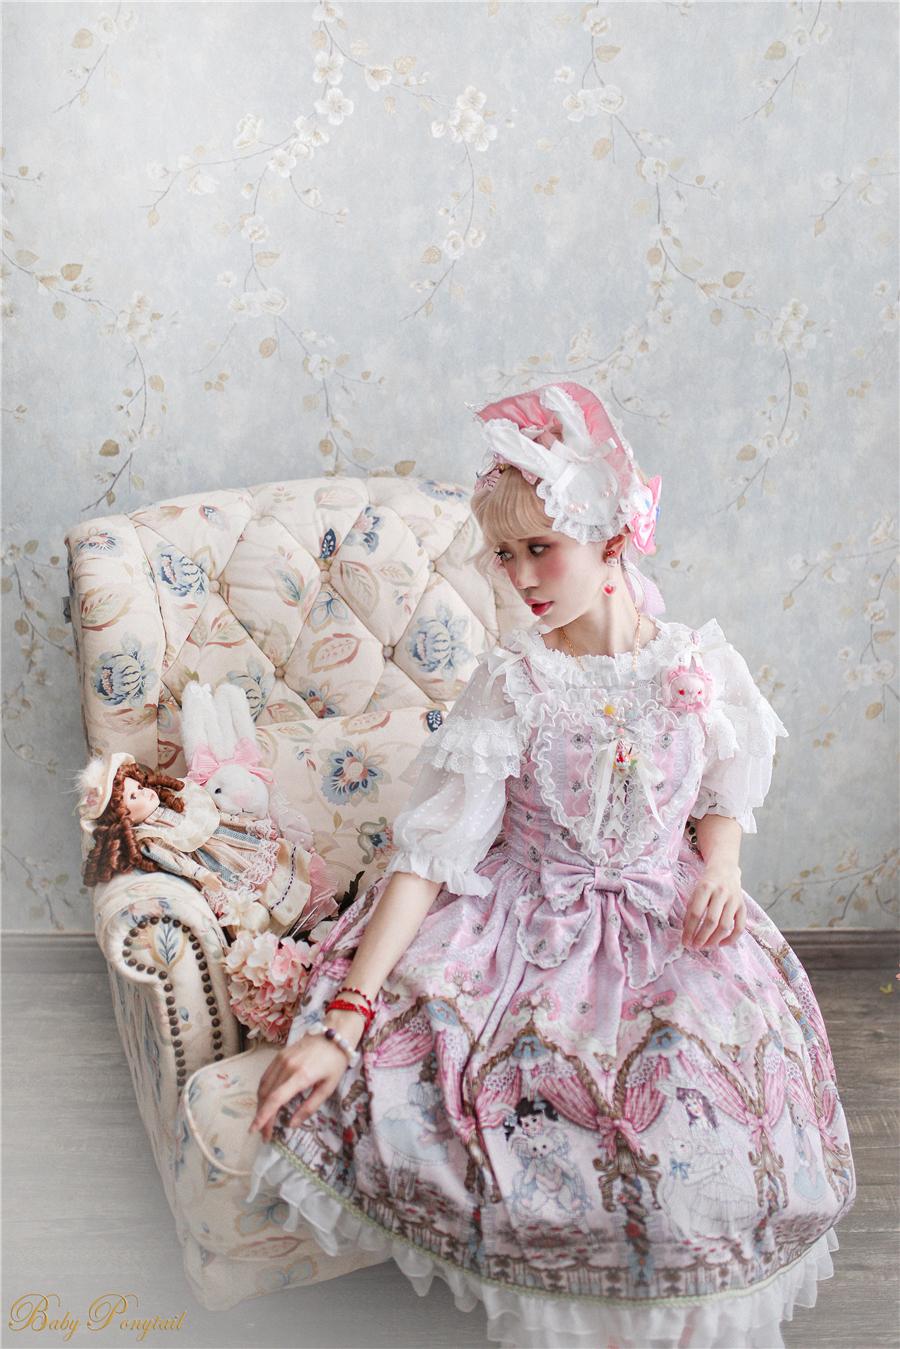 BabyPonytail_Model Photo_My Favorite Companion_JSK Pink_Kaka_06.jpg